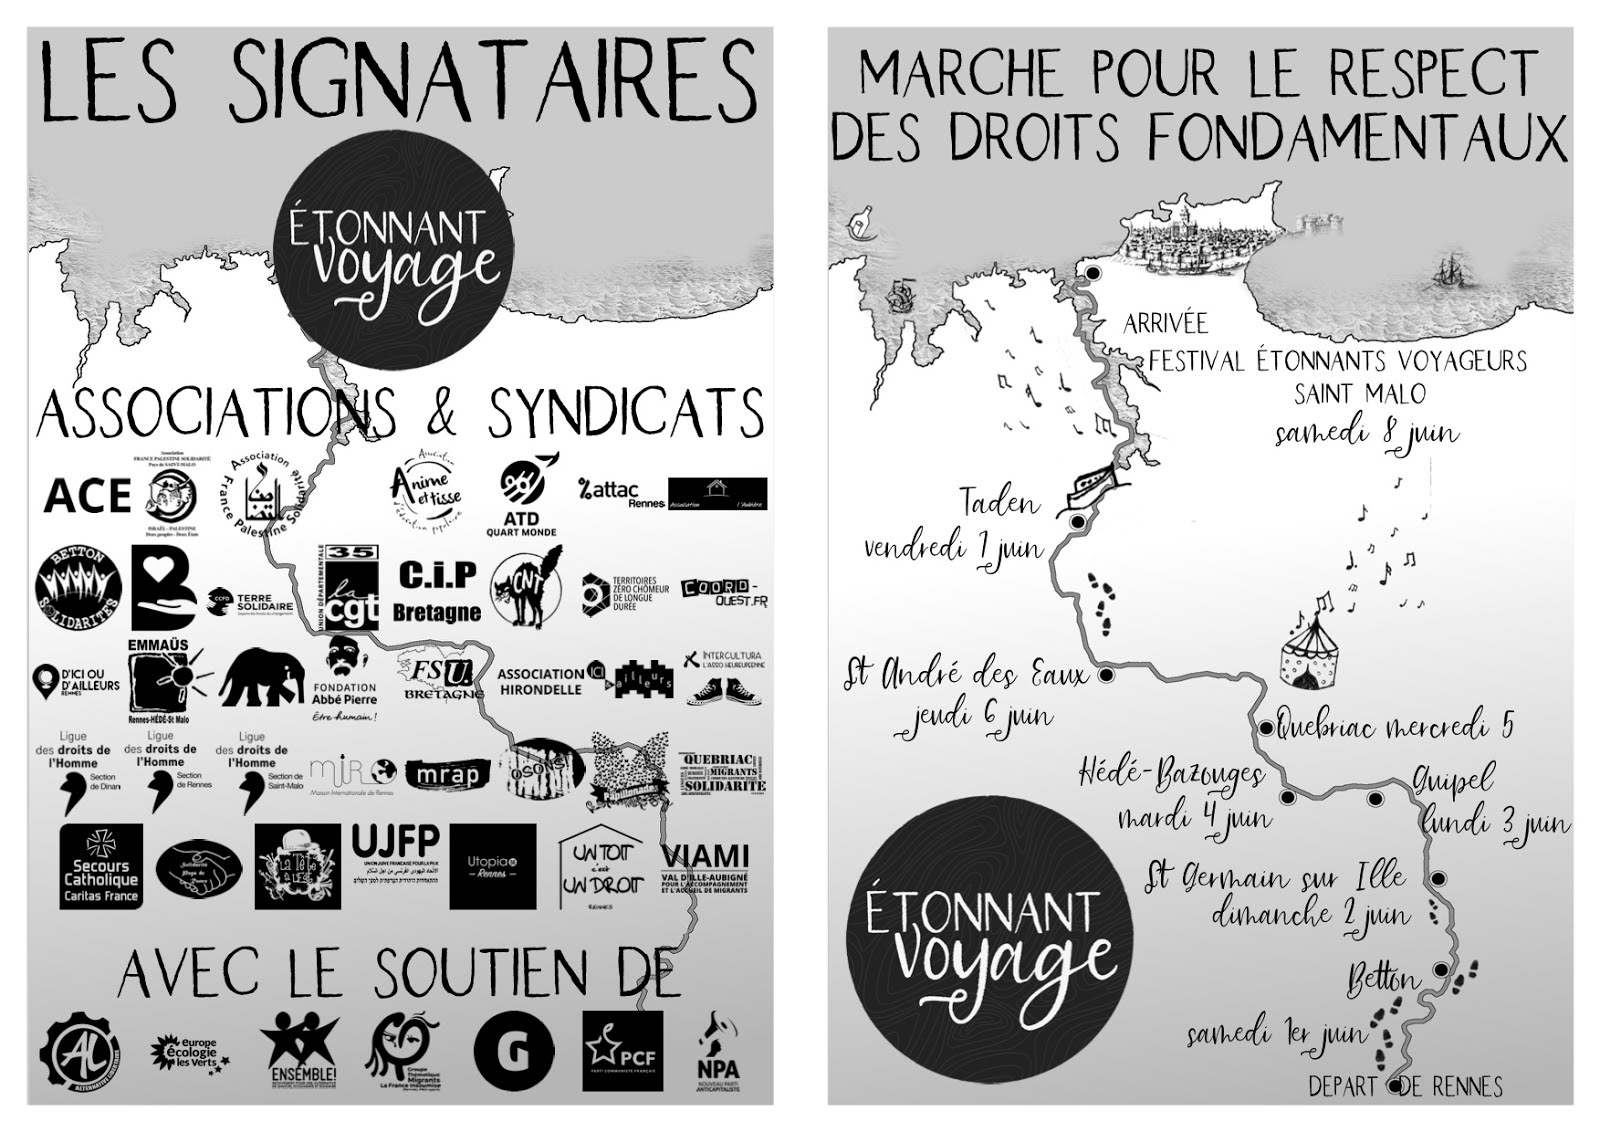 l'Etonnant voyage _ Rennes Saint Malo - 1-8 juin 2019